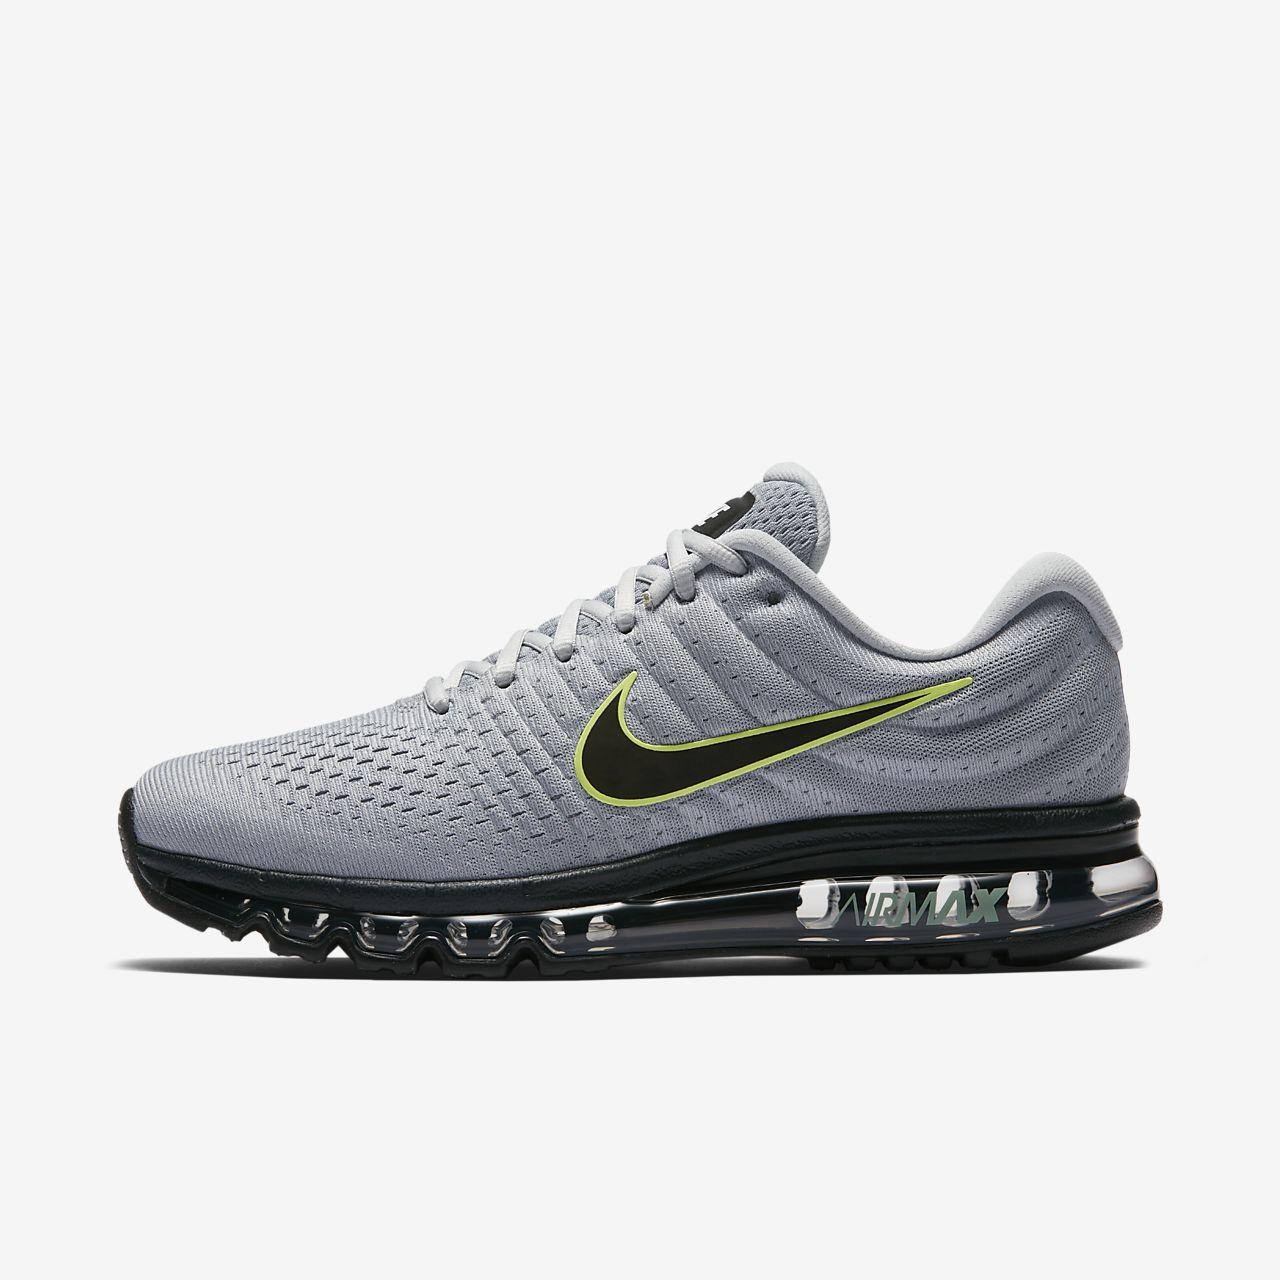 206184cb Мужские кроссовки Nike Air Max 2017. Nike.com RU